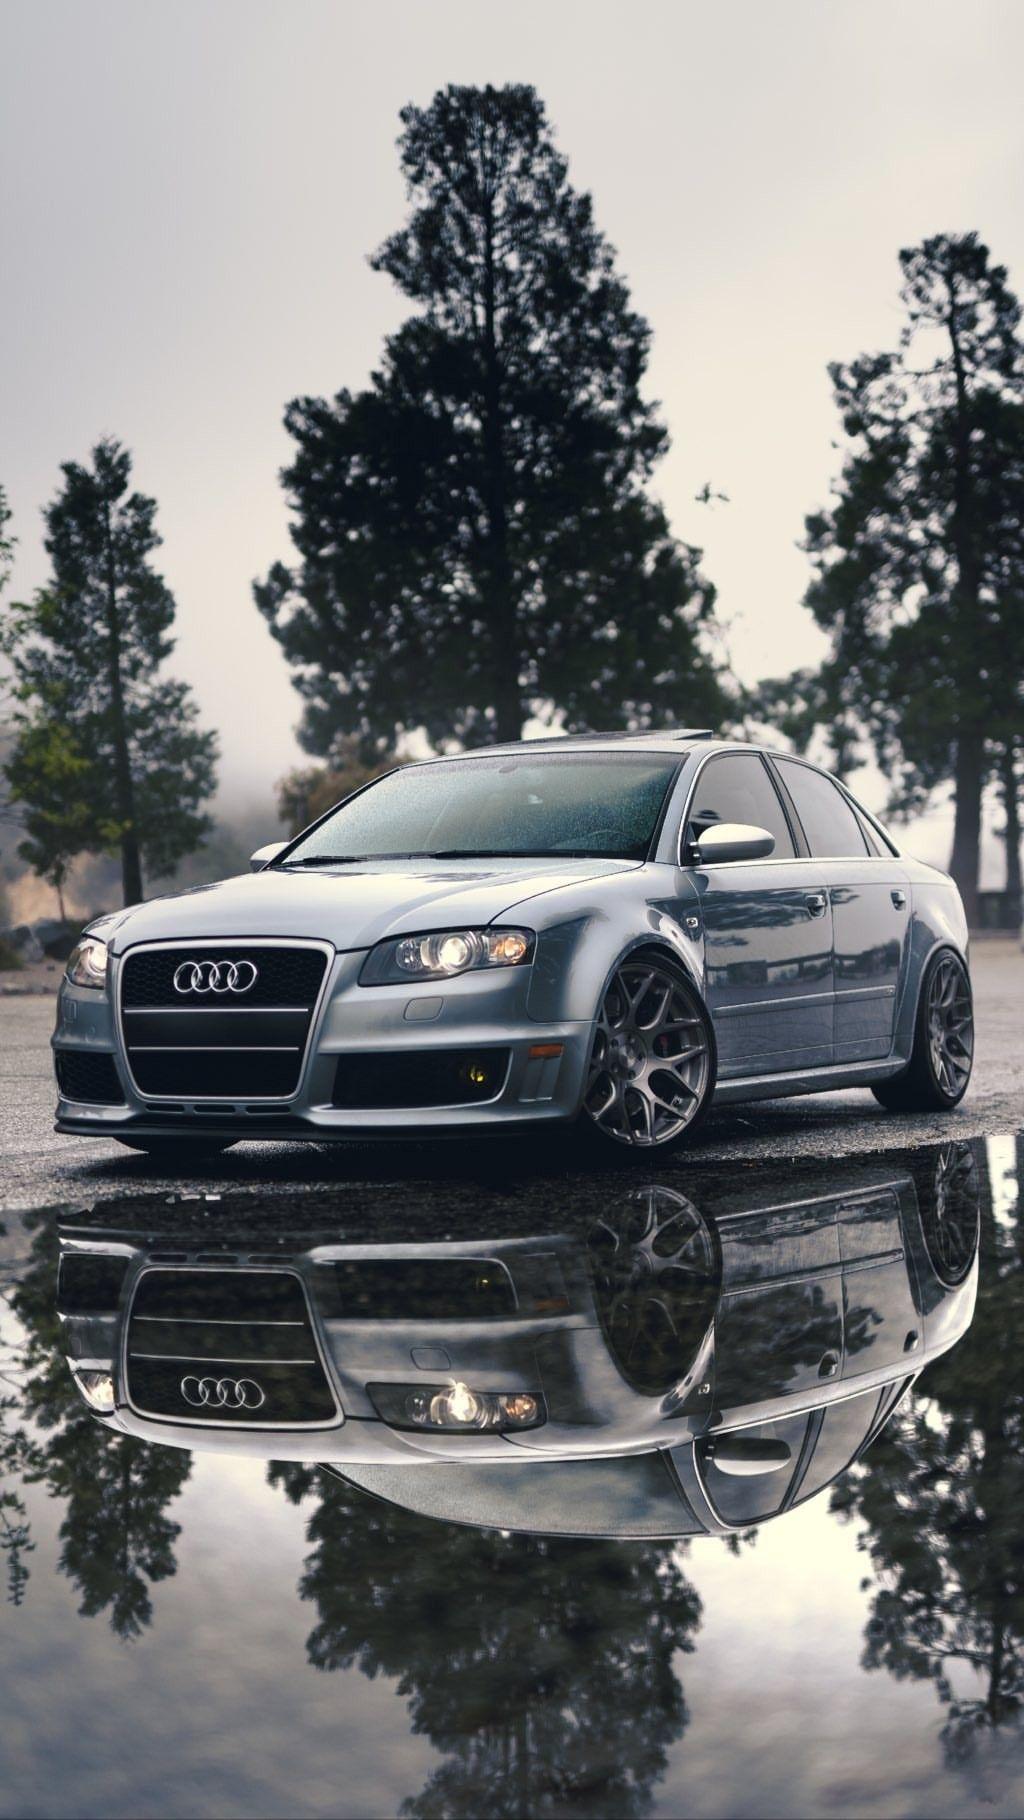 Audi Rs4 B7 Audi Audi A4 B7